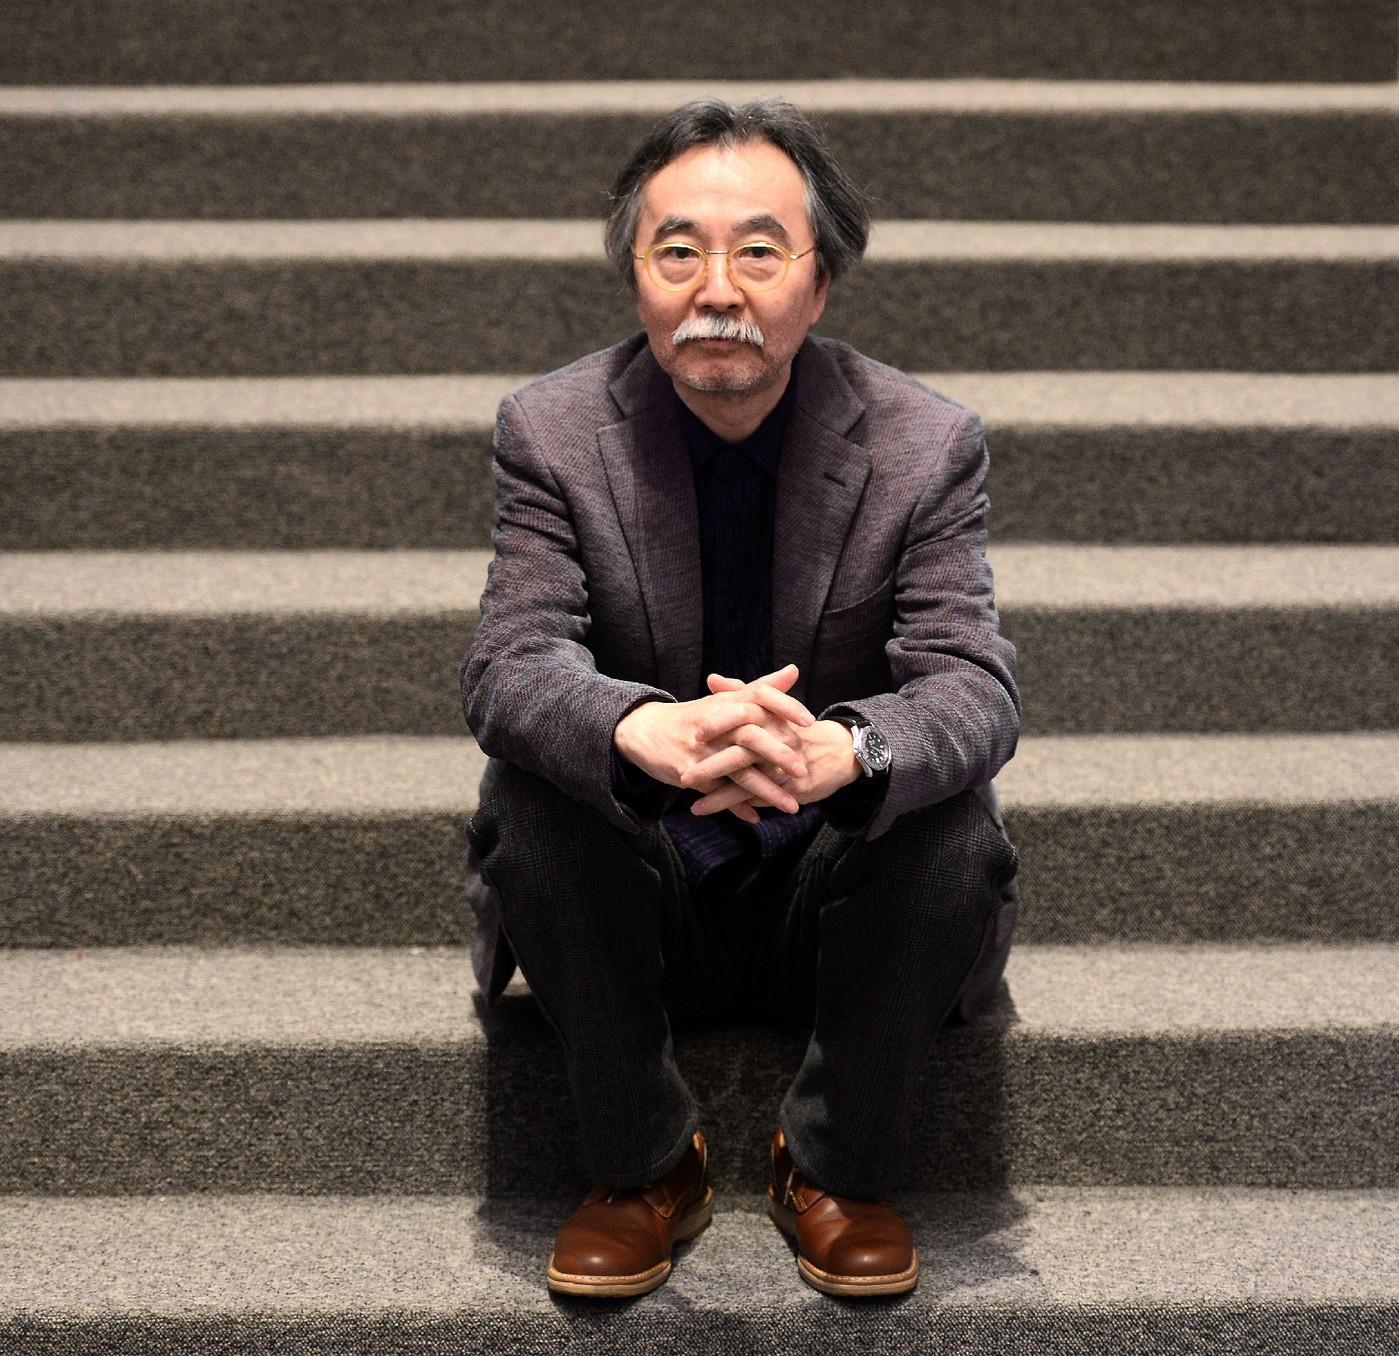 Jiro-Taniguchi-26-janvier-2015-Paris_1_1400_1356